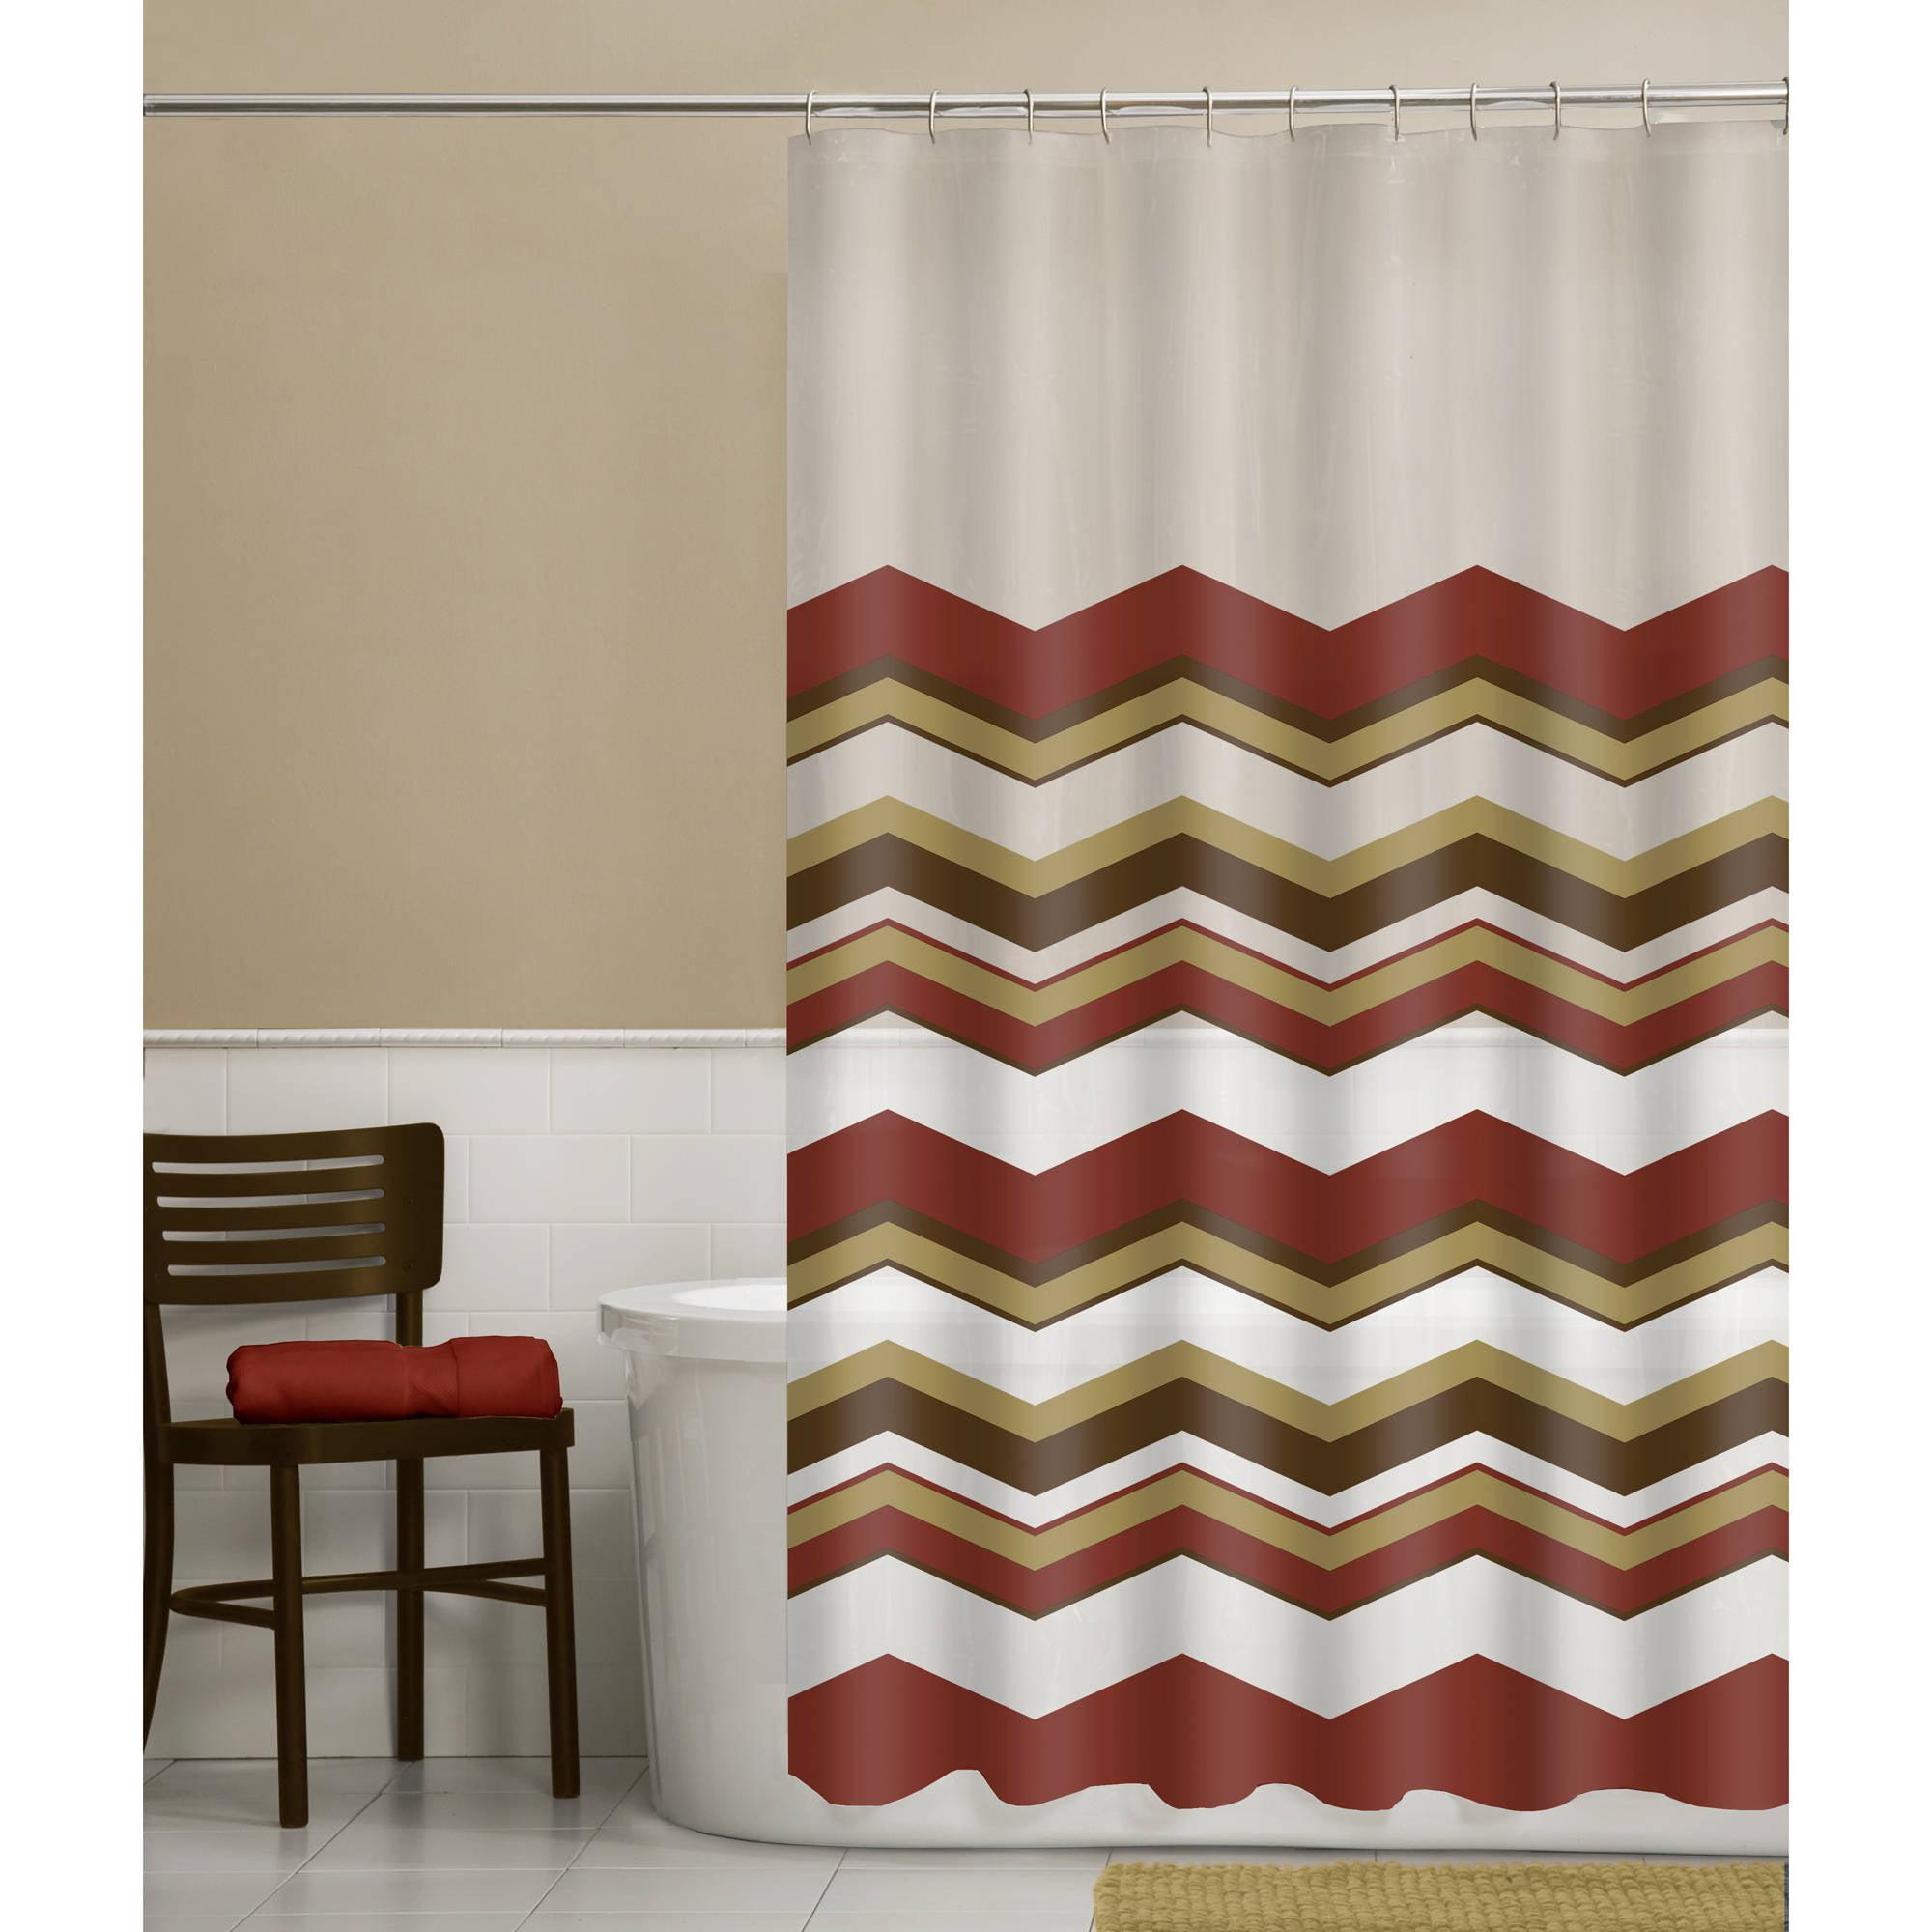 Maytex Chevron 13-Piece PEVA Shower Curtain Set